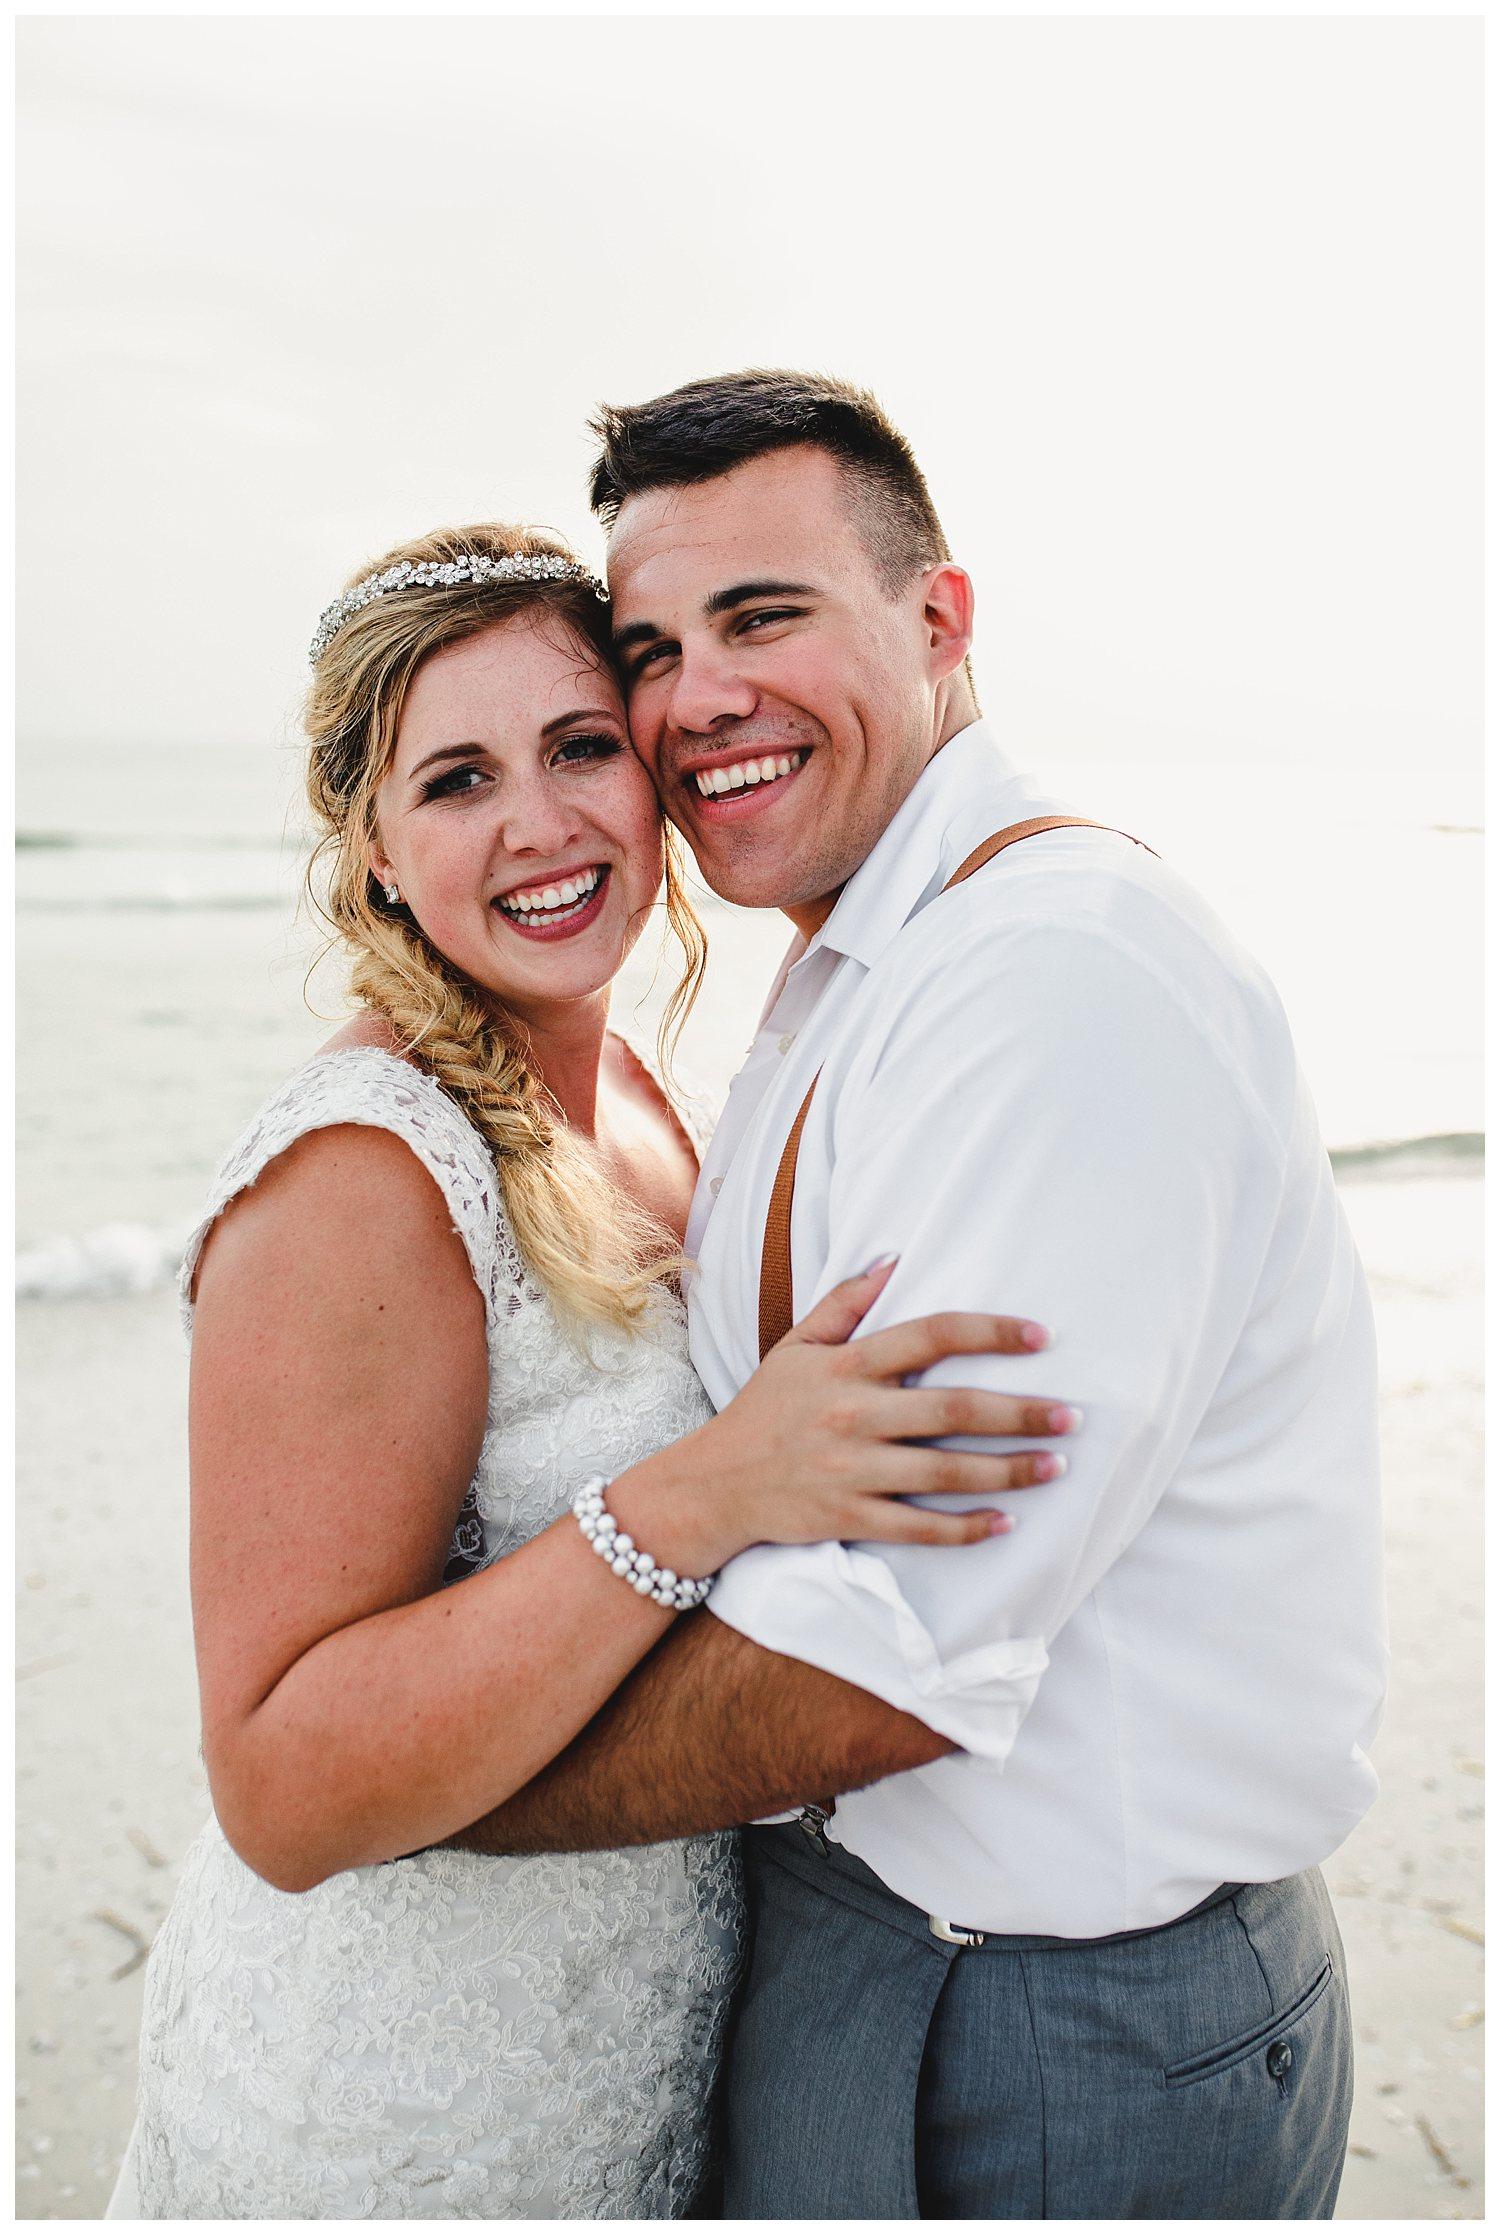 Kelsey_Diane_Photography_Destination_Wedding_Sarasota_Florida_Beach_Wedding_Alex_Austin_0676.jpg